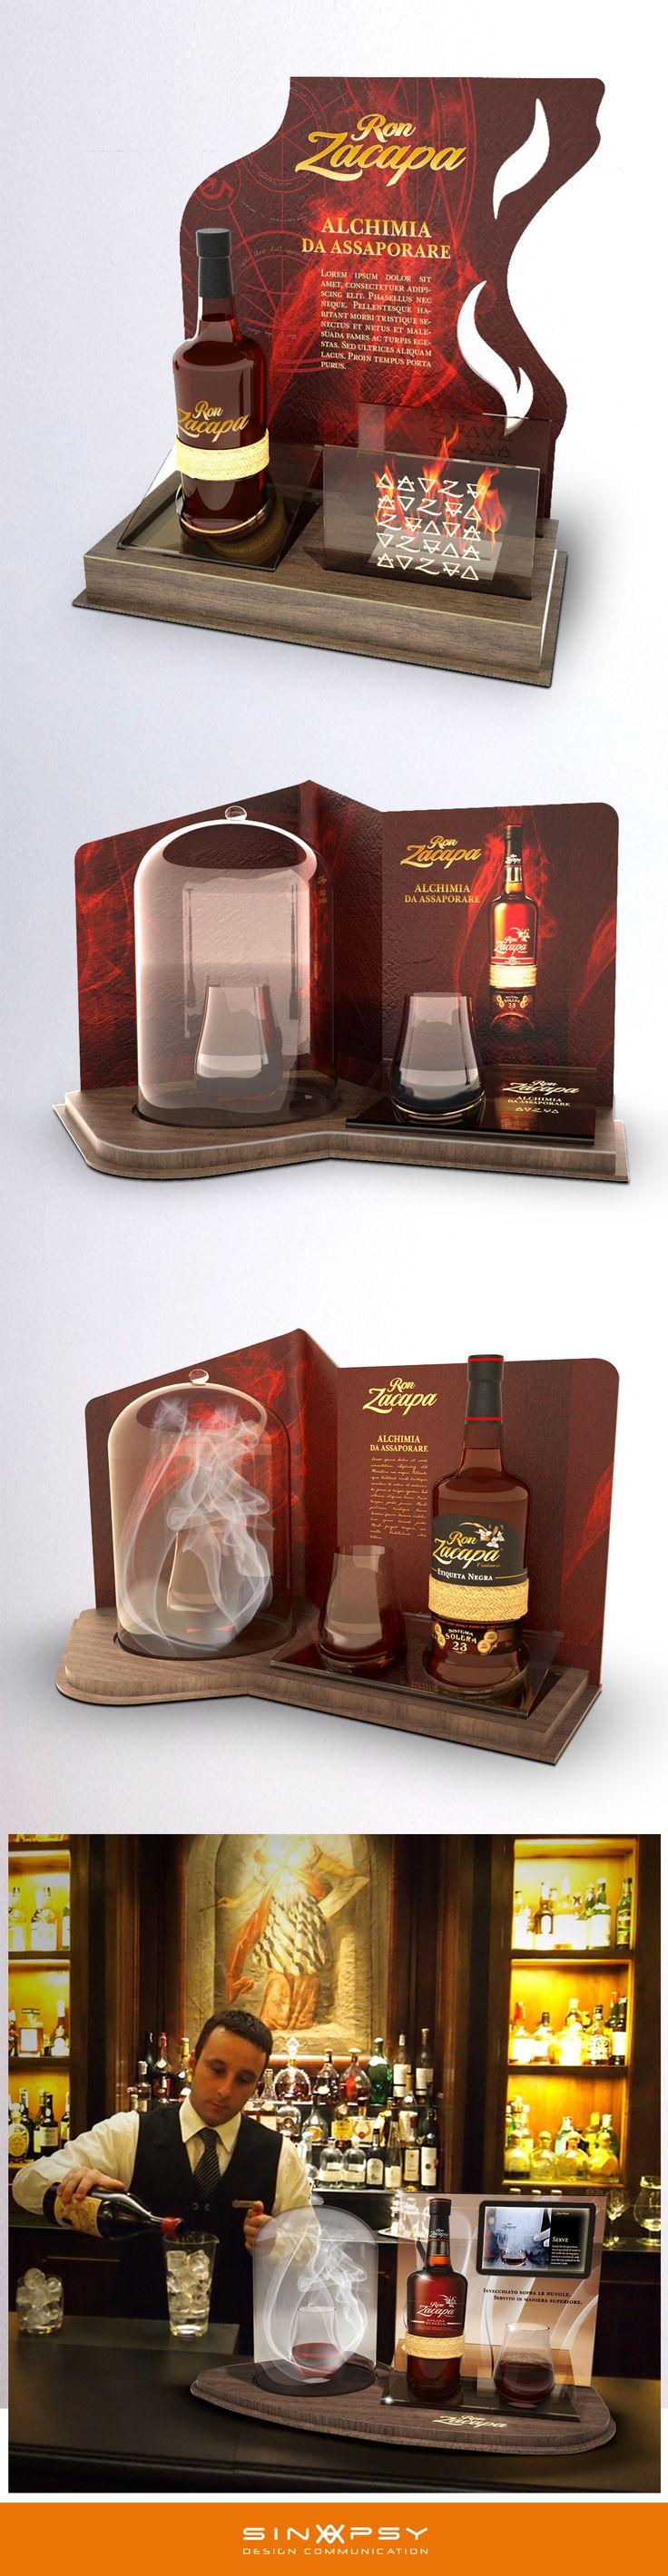 Zacapa Bottle Glorifier project